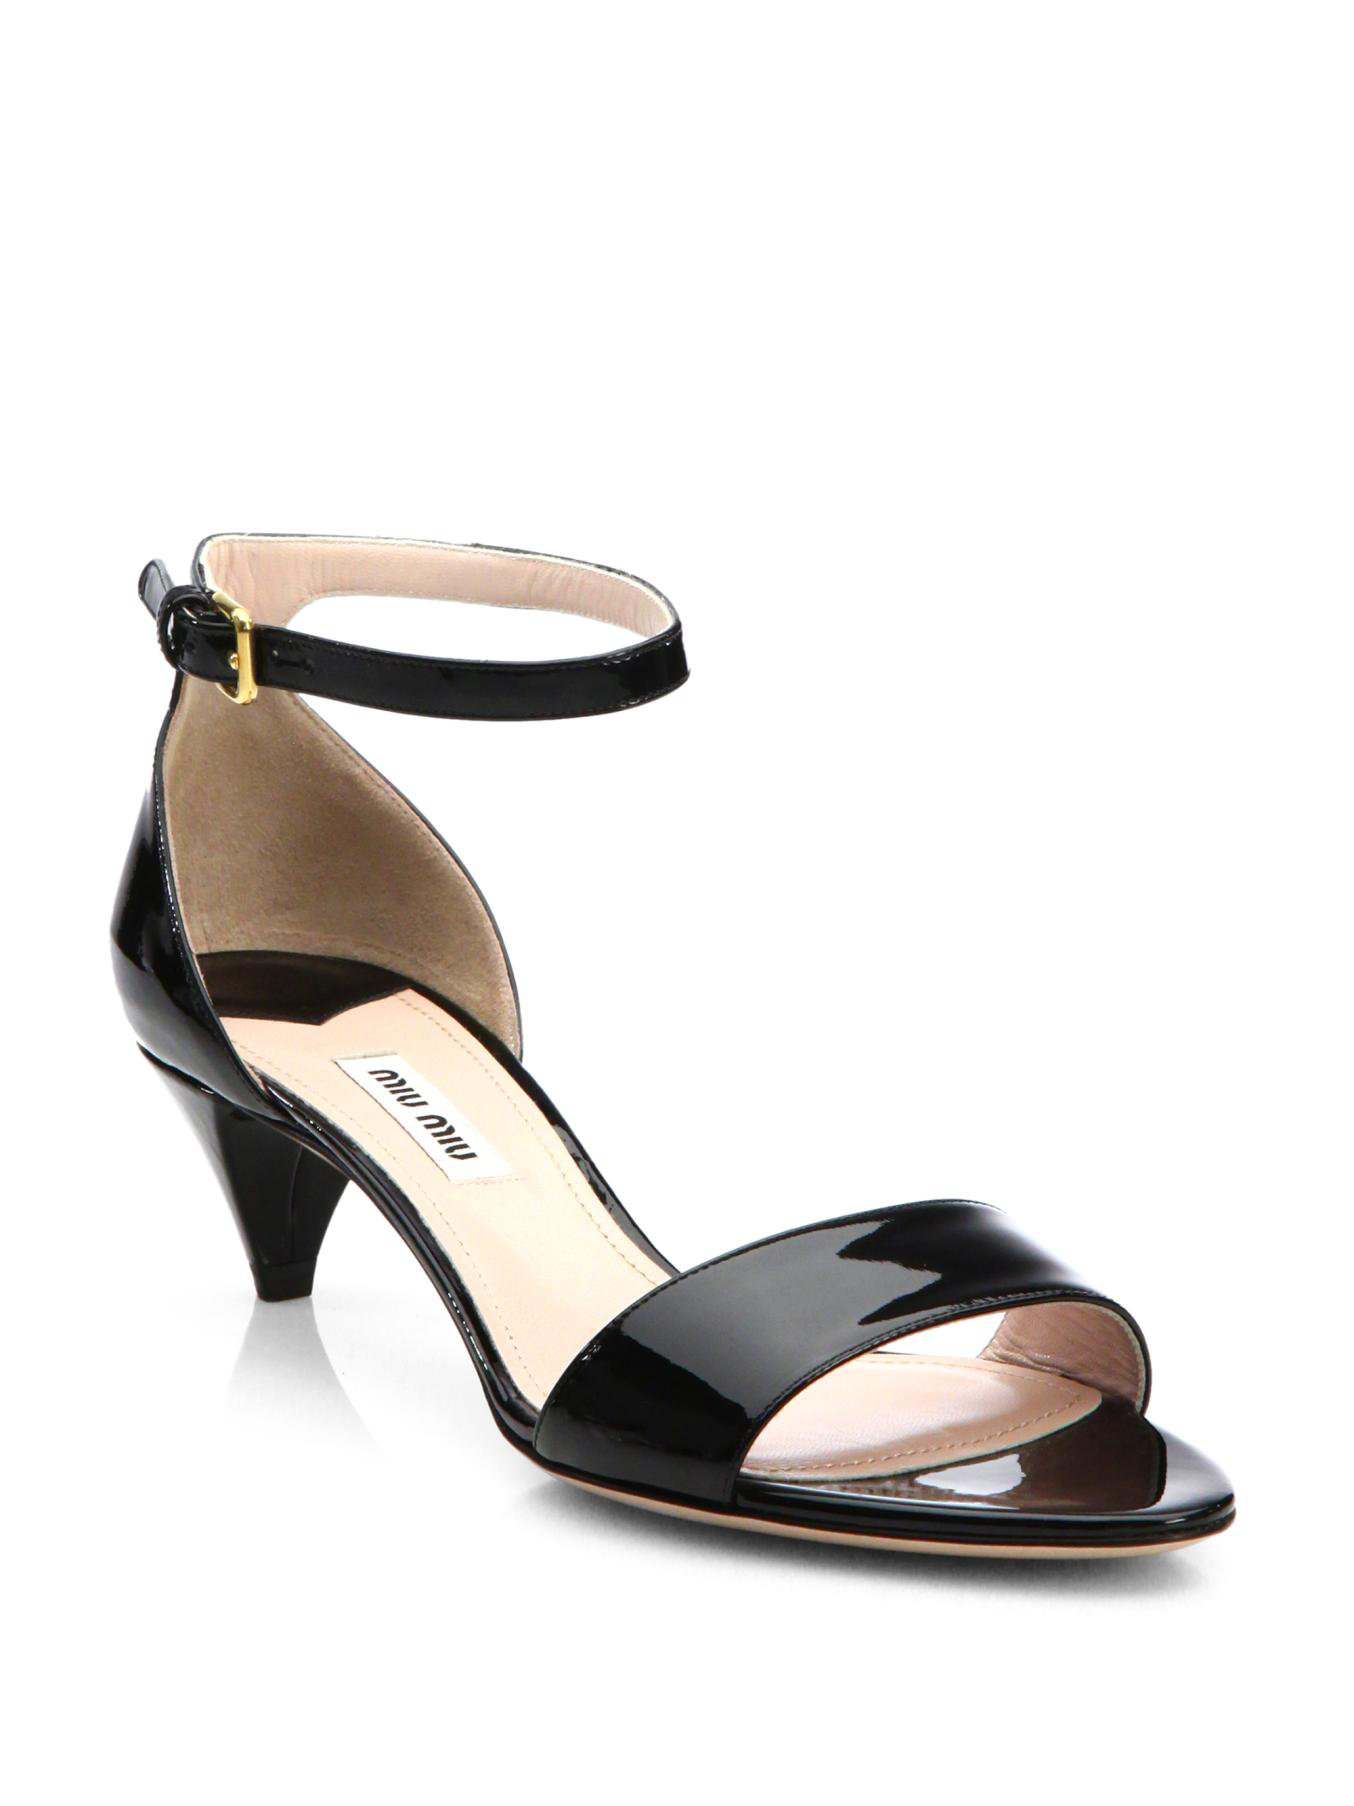 Black Heel Vbigmyf76y In Patent Leather Sandals Kitten Lyst Miu lFTKJ1c